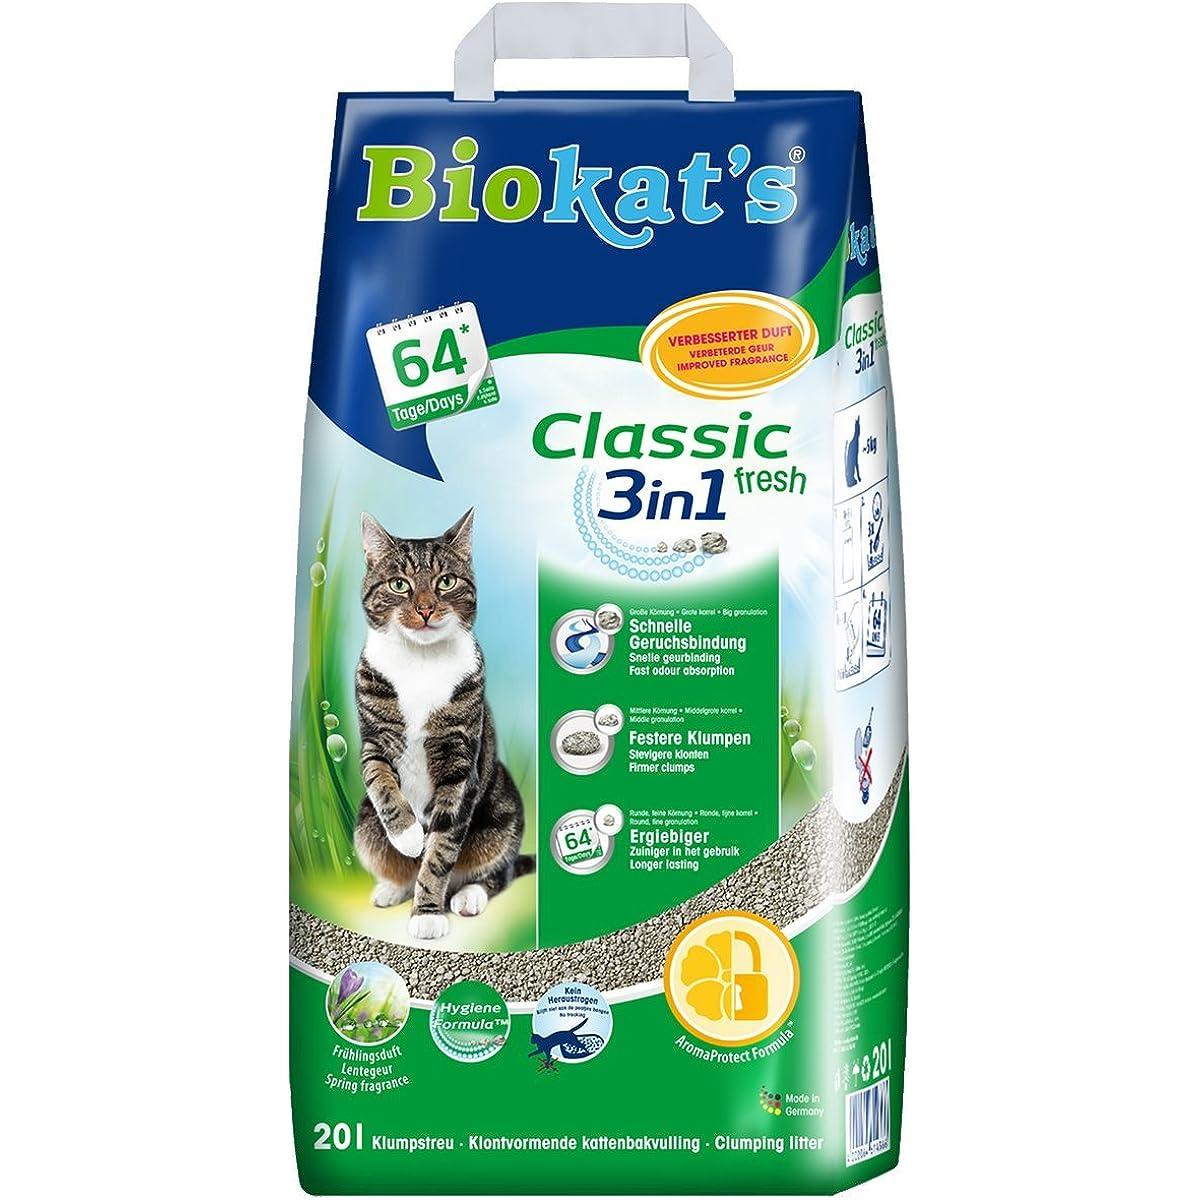 Biokats Classic 3 in 1